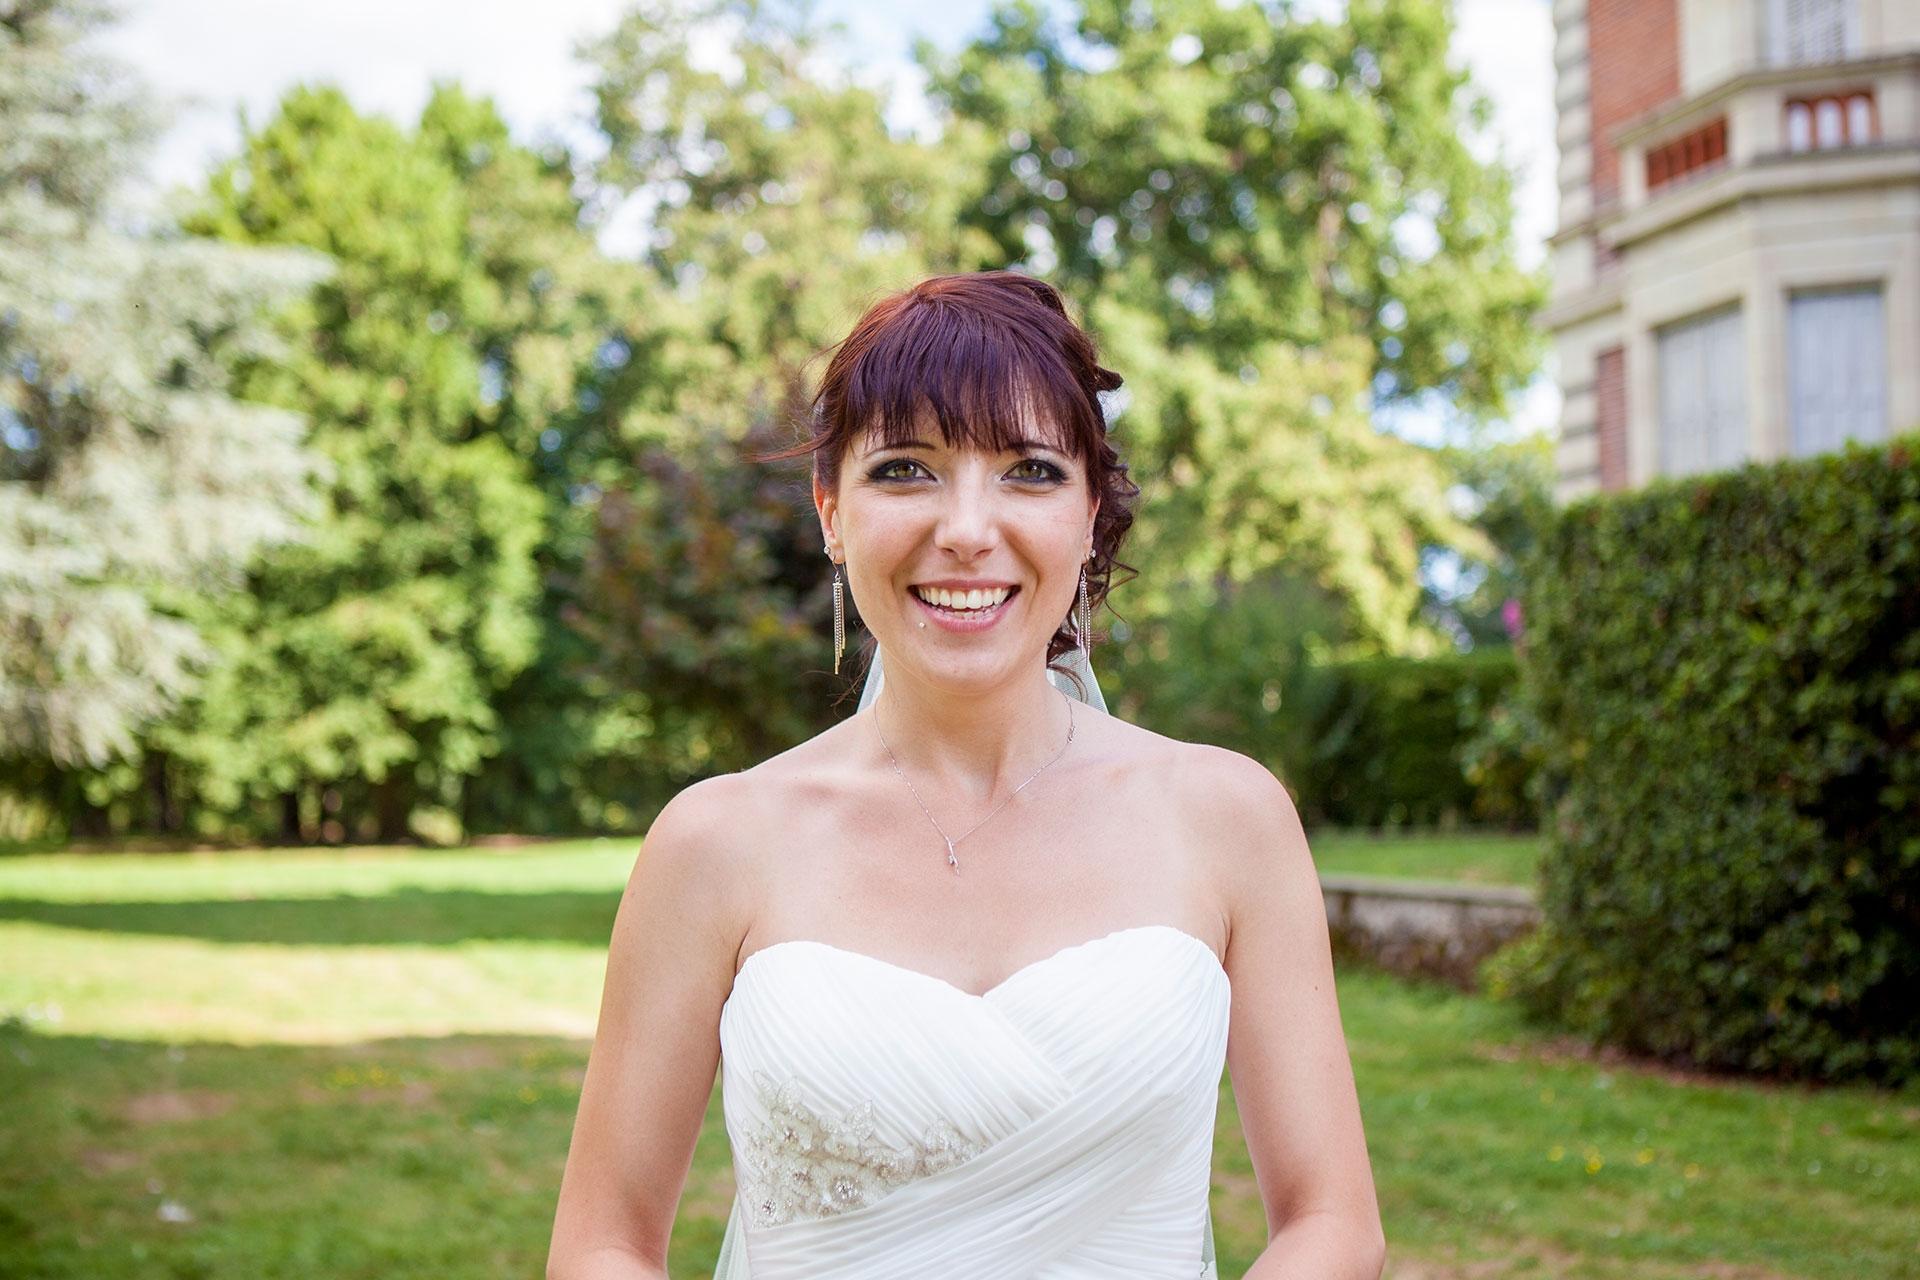 particuliers-evenements-mariages-oui-aurelie&geoffrey-31